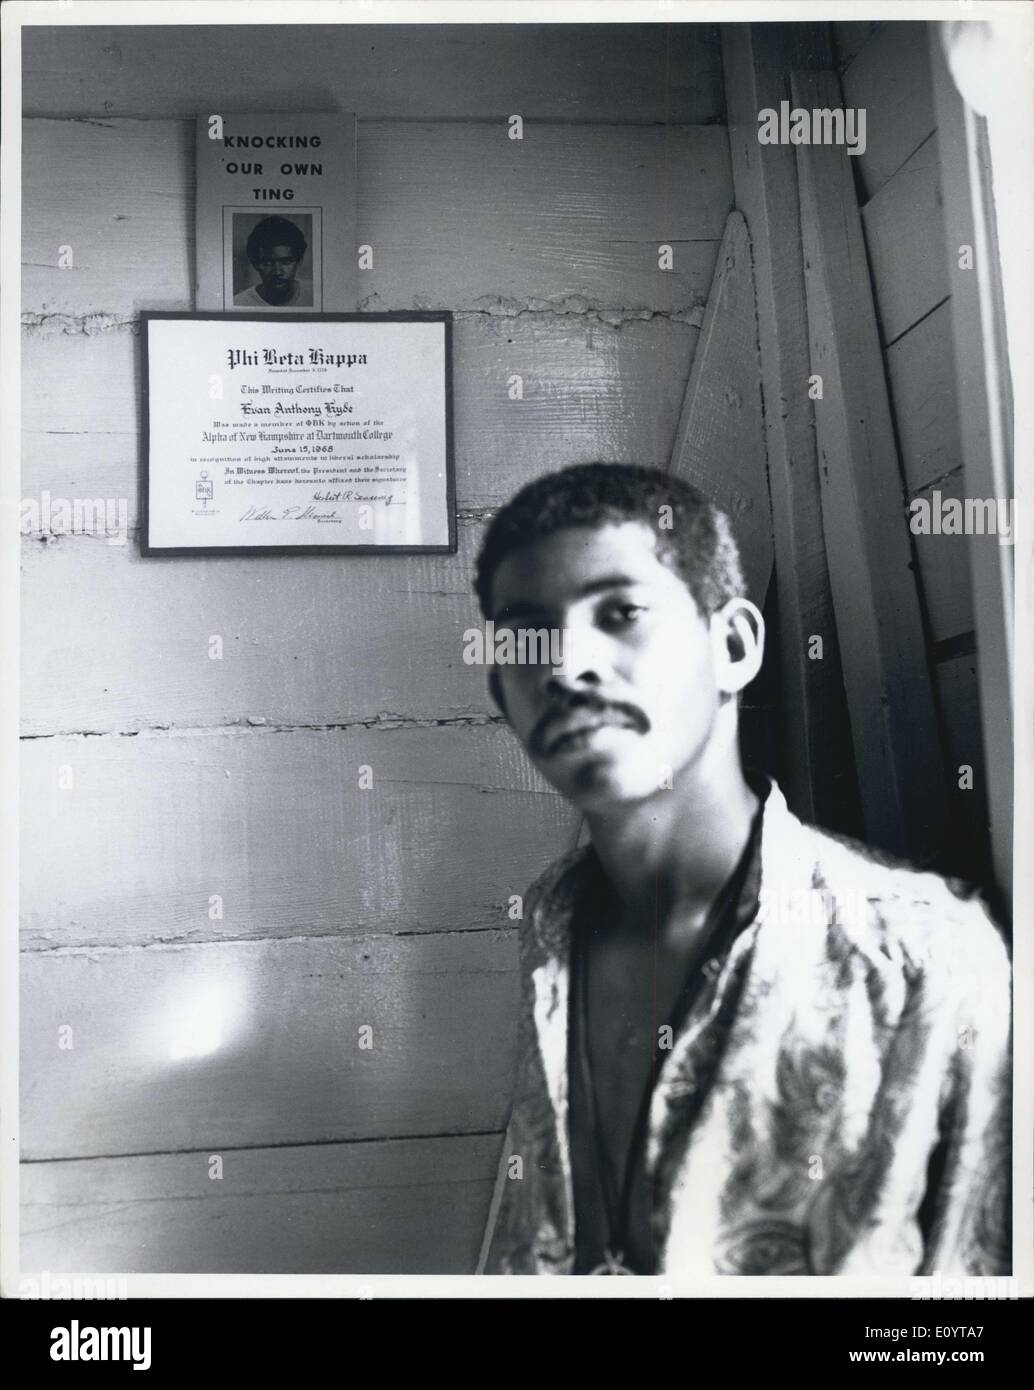 May 10, 1971 - Evan X Hyde: Head of U.B.A.D the black power party of British Honduras. He is a Phi eta Kappa graduate of Darmouth College - Stock Image